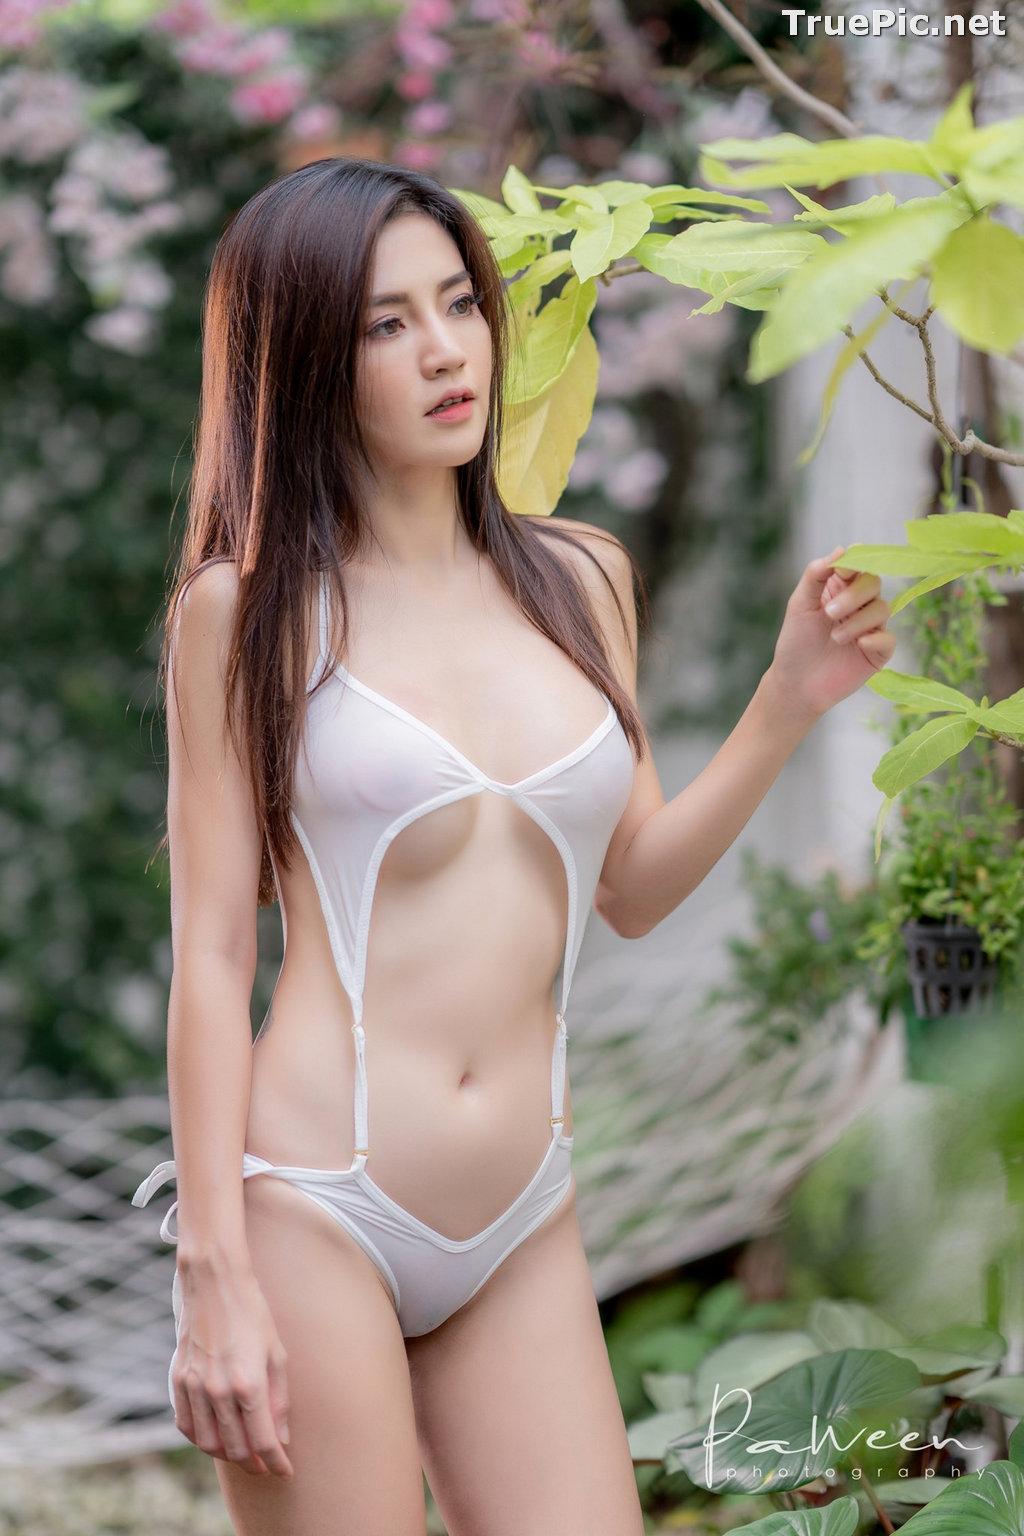 Image Thailand Model - Ladapa Ratchataamonchot - Sexy Garden - TruePic.net - Picture-5